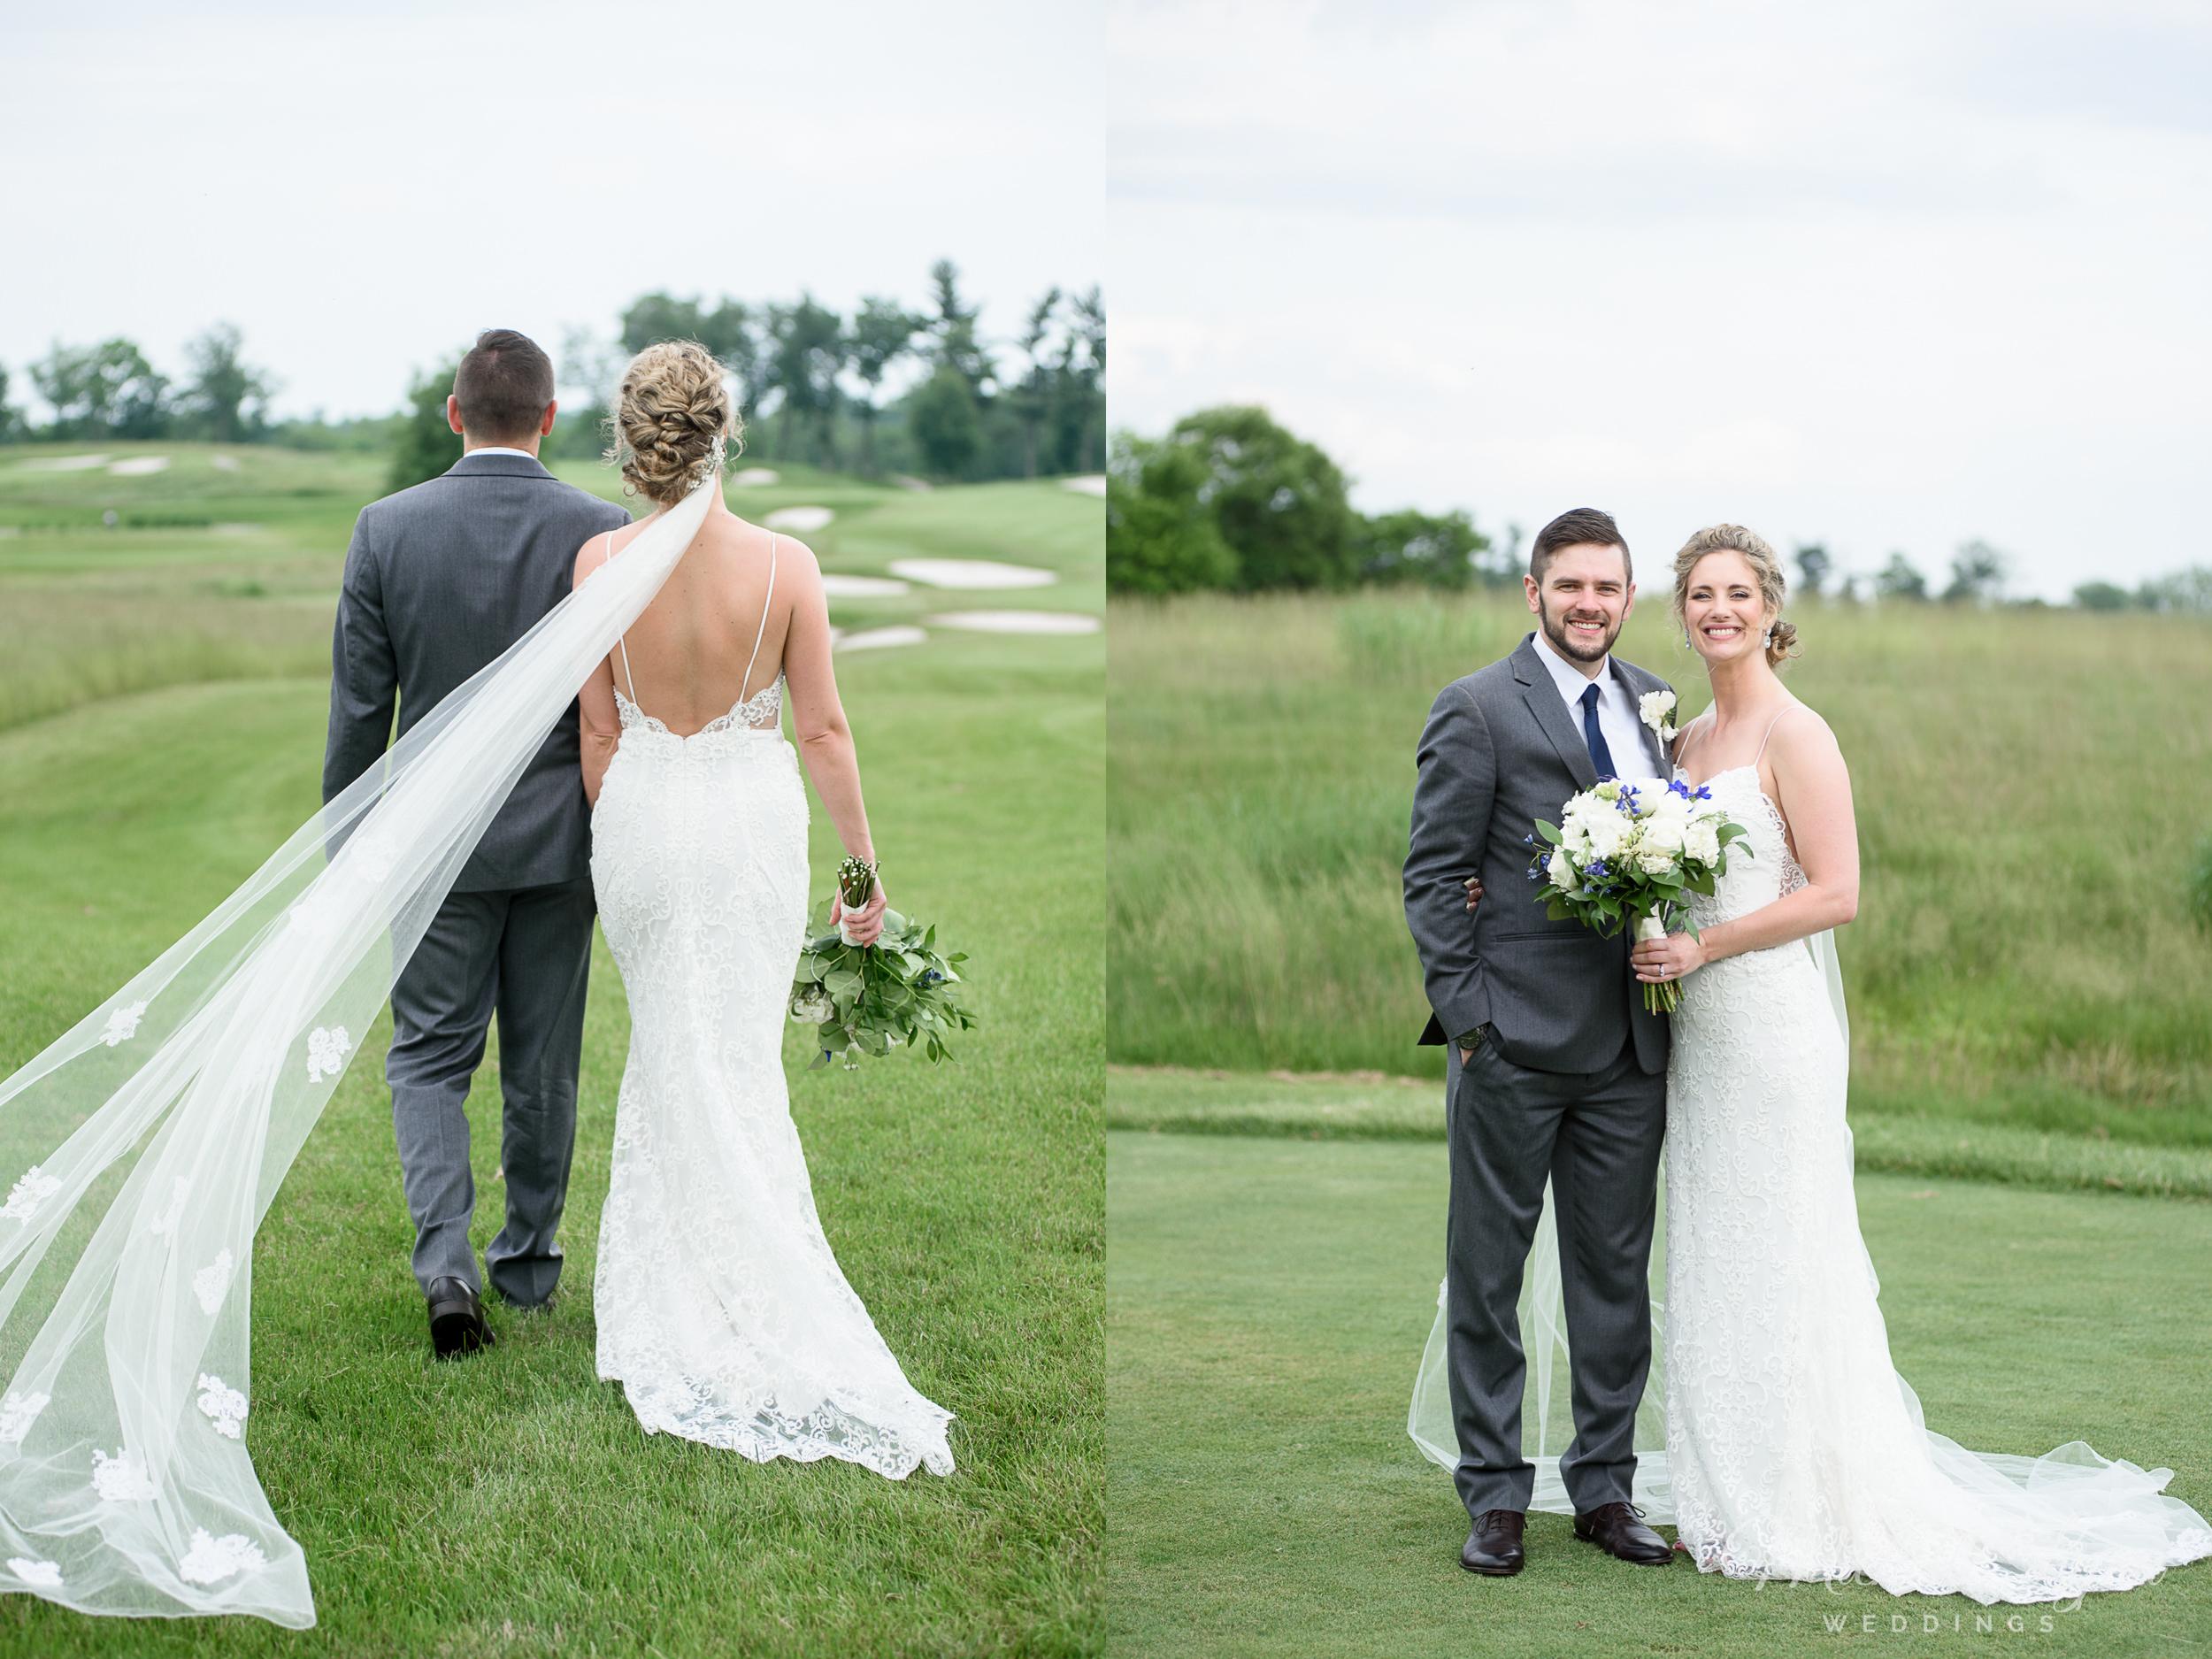 mlw-jericho-national-golf-club-wedding-photography-37.jpg